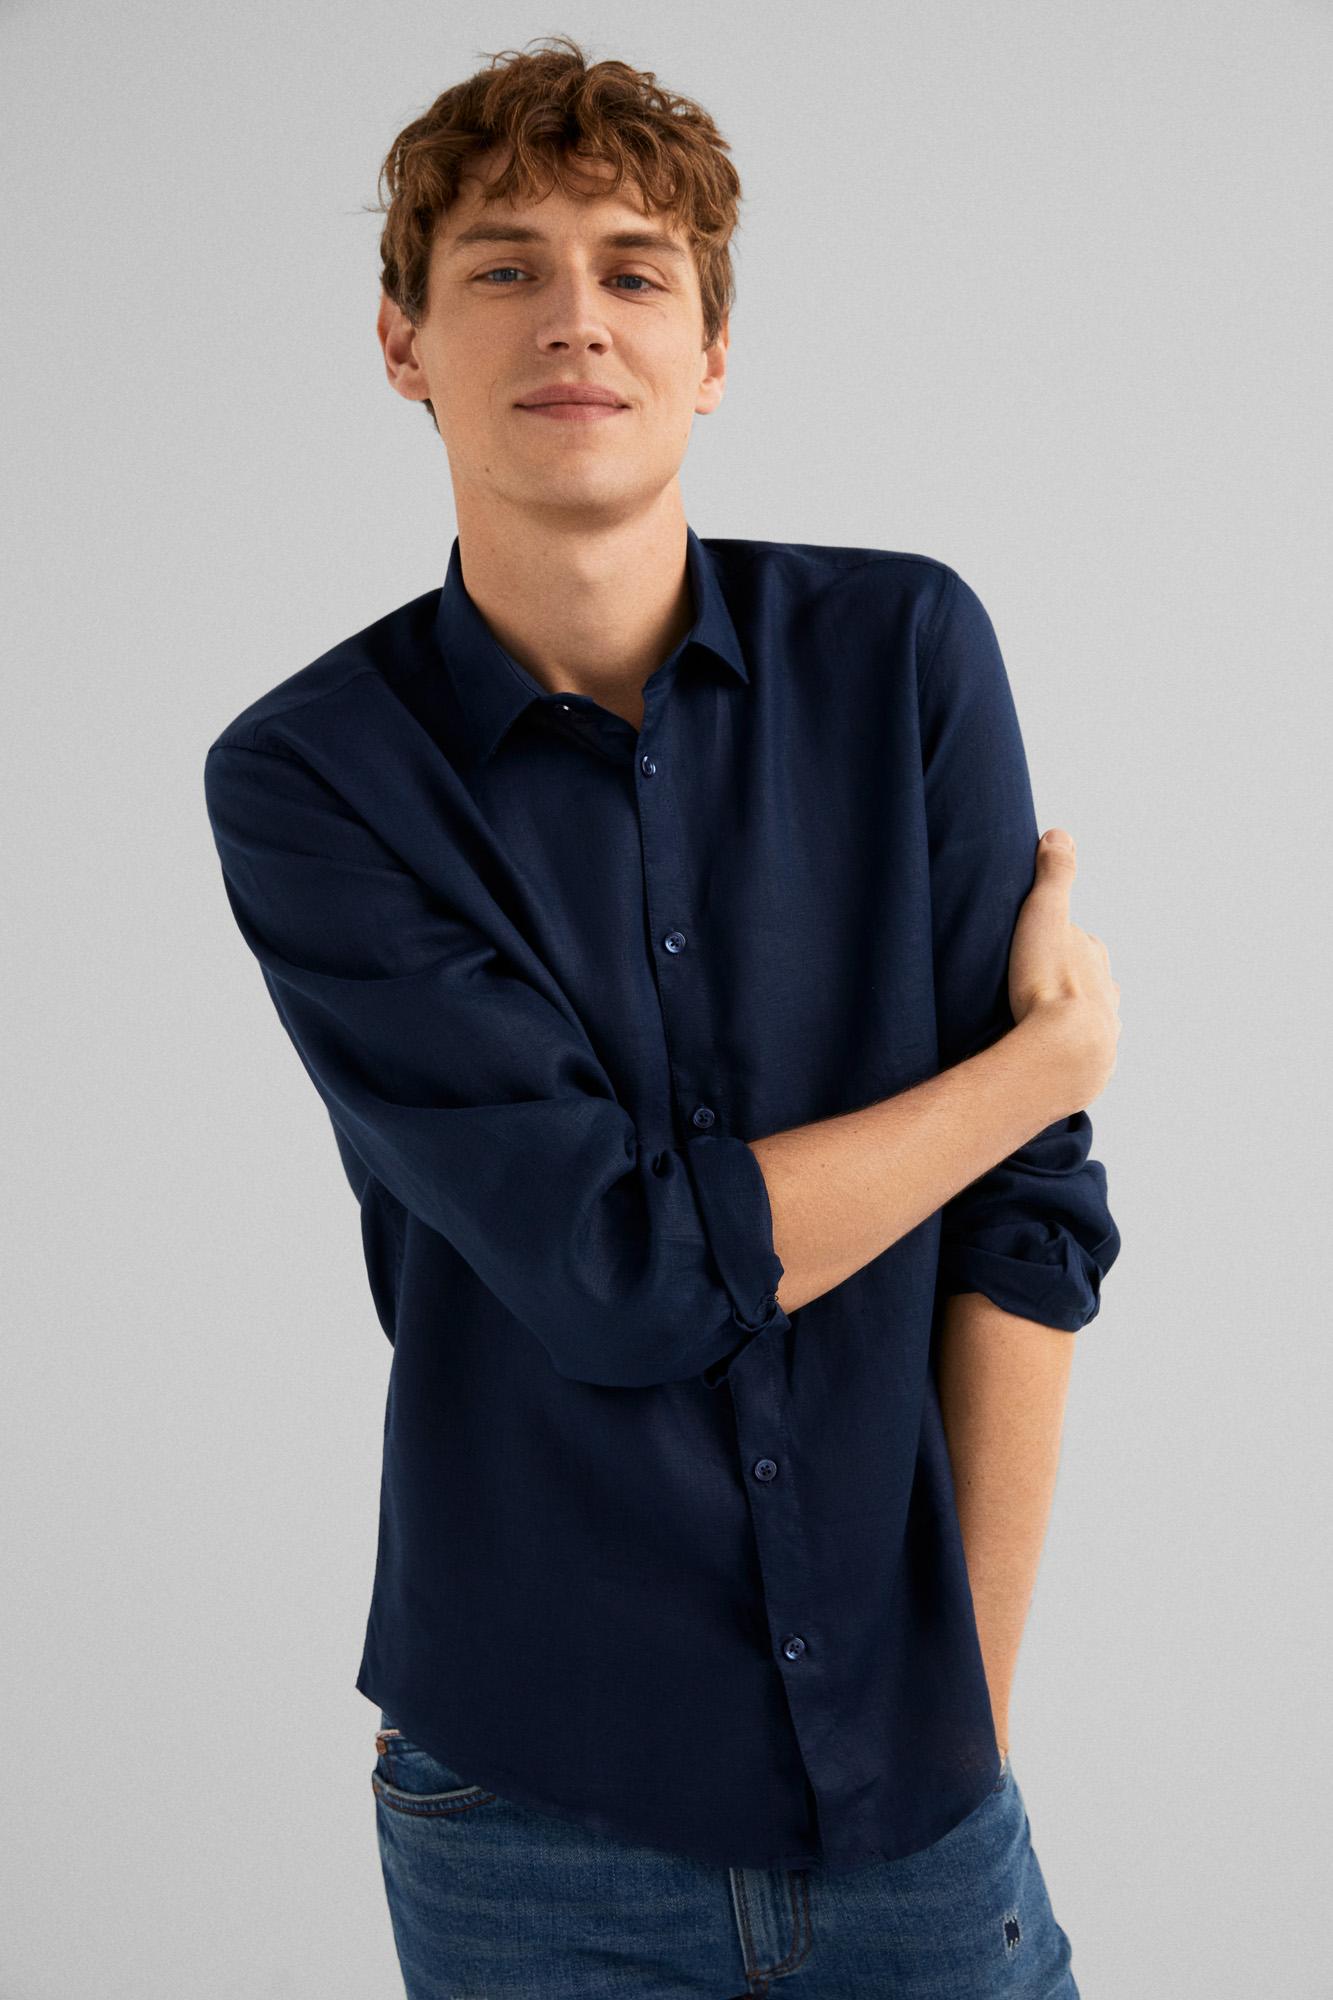 a200aabb4a Camisa lino premium